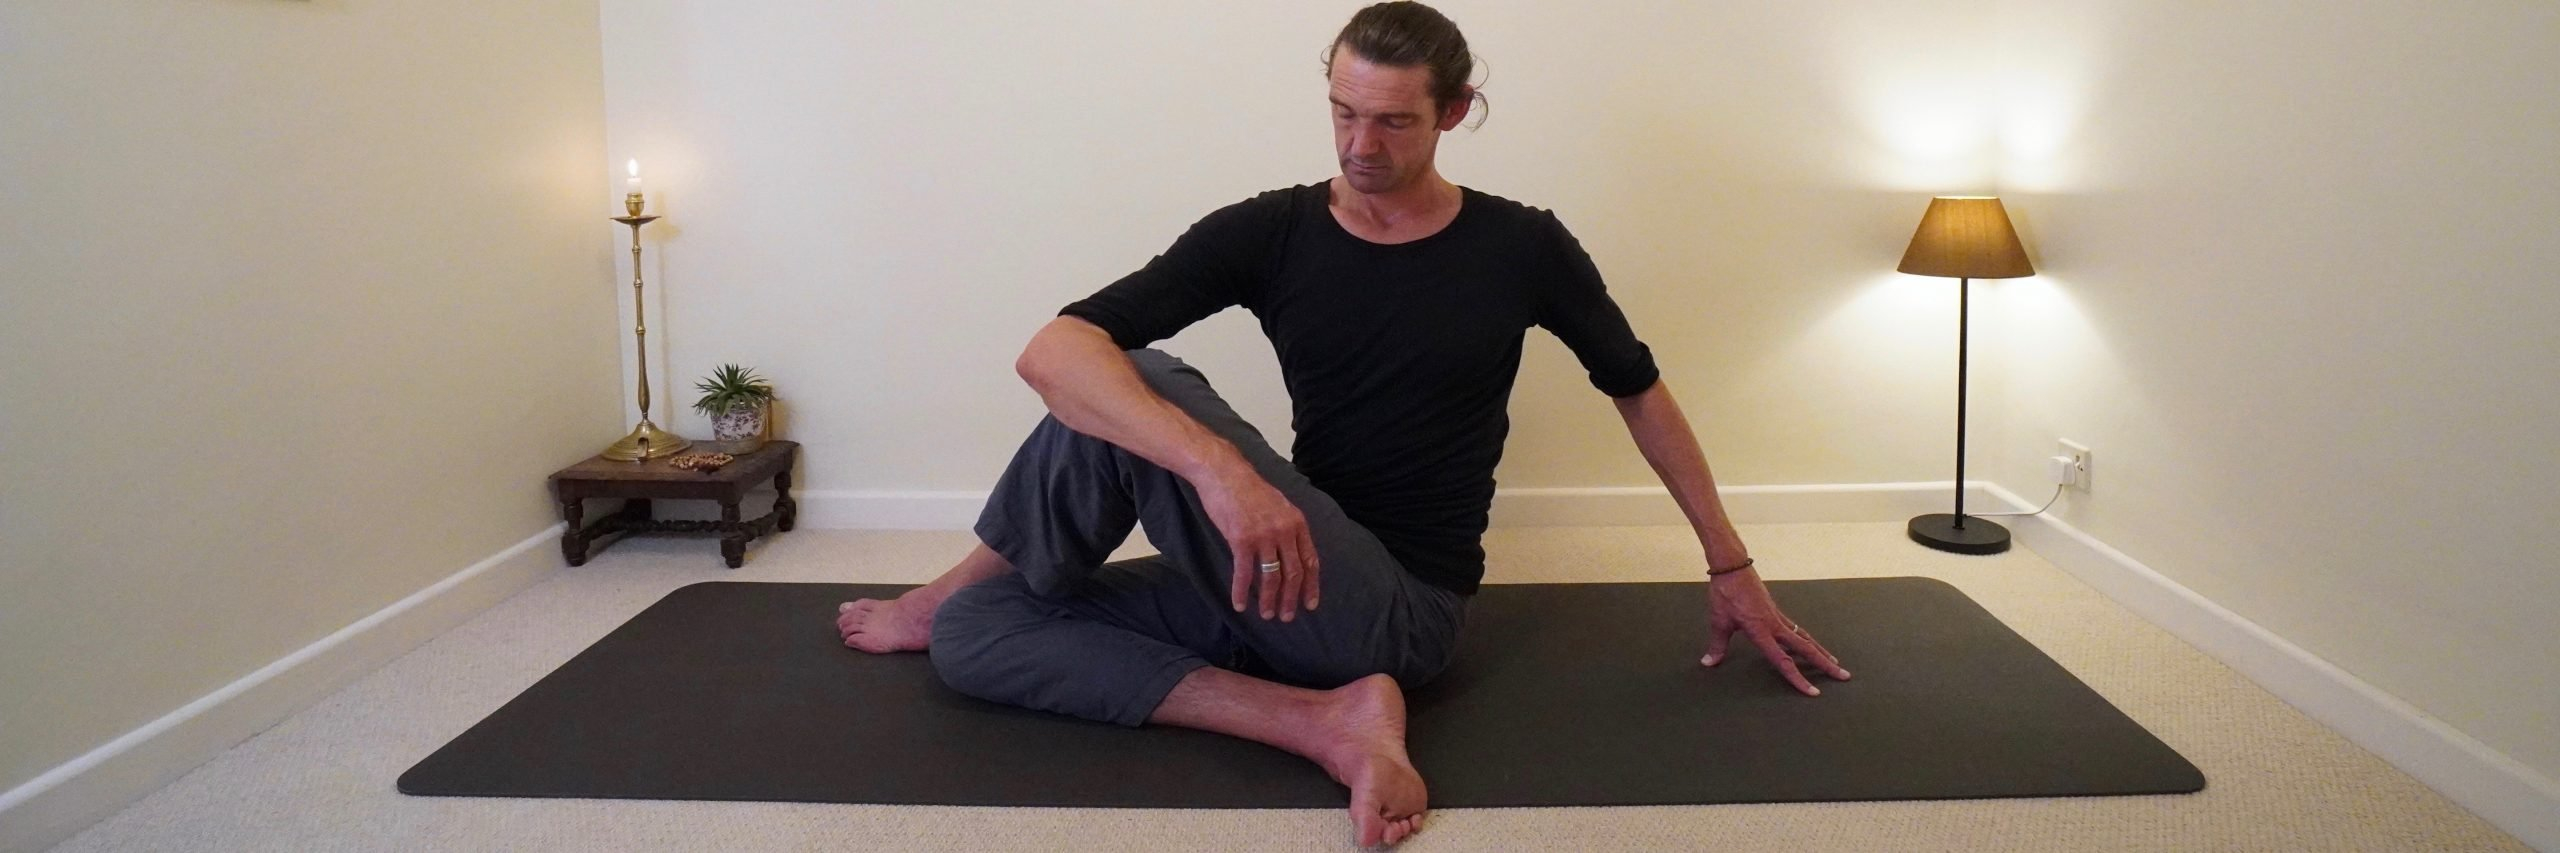 Exploring a Sitting Twist